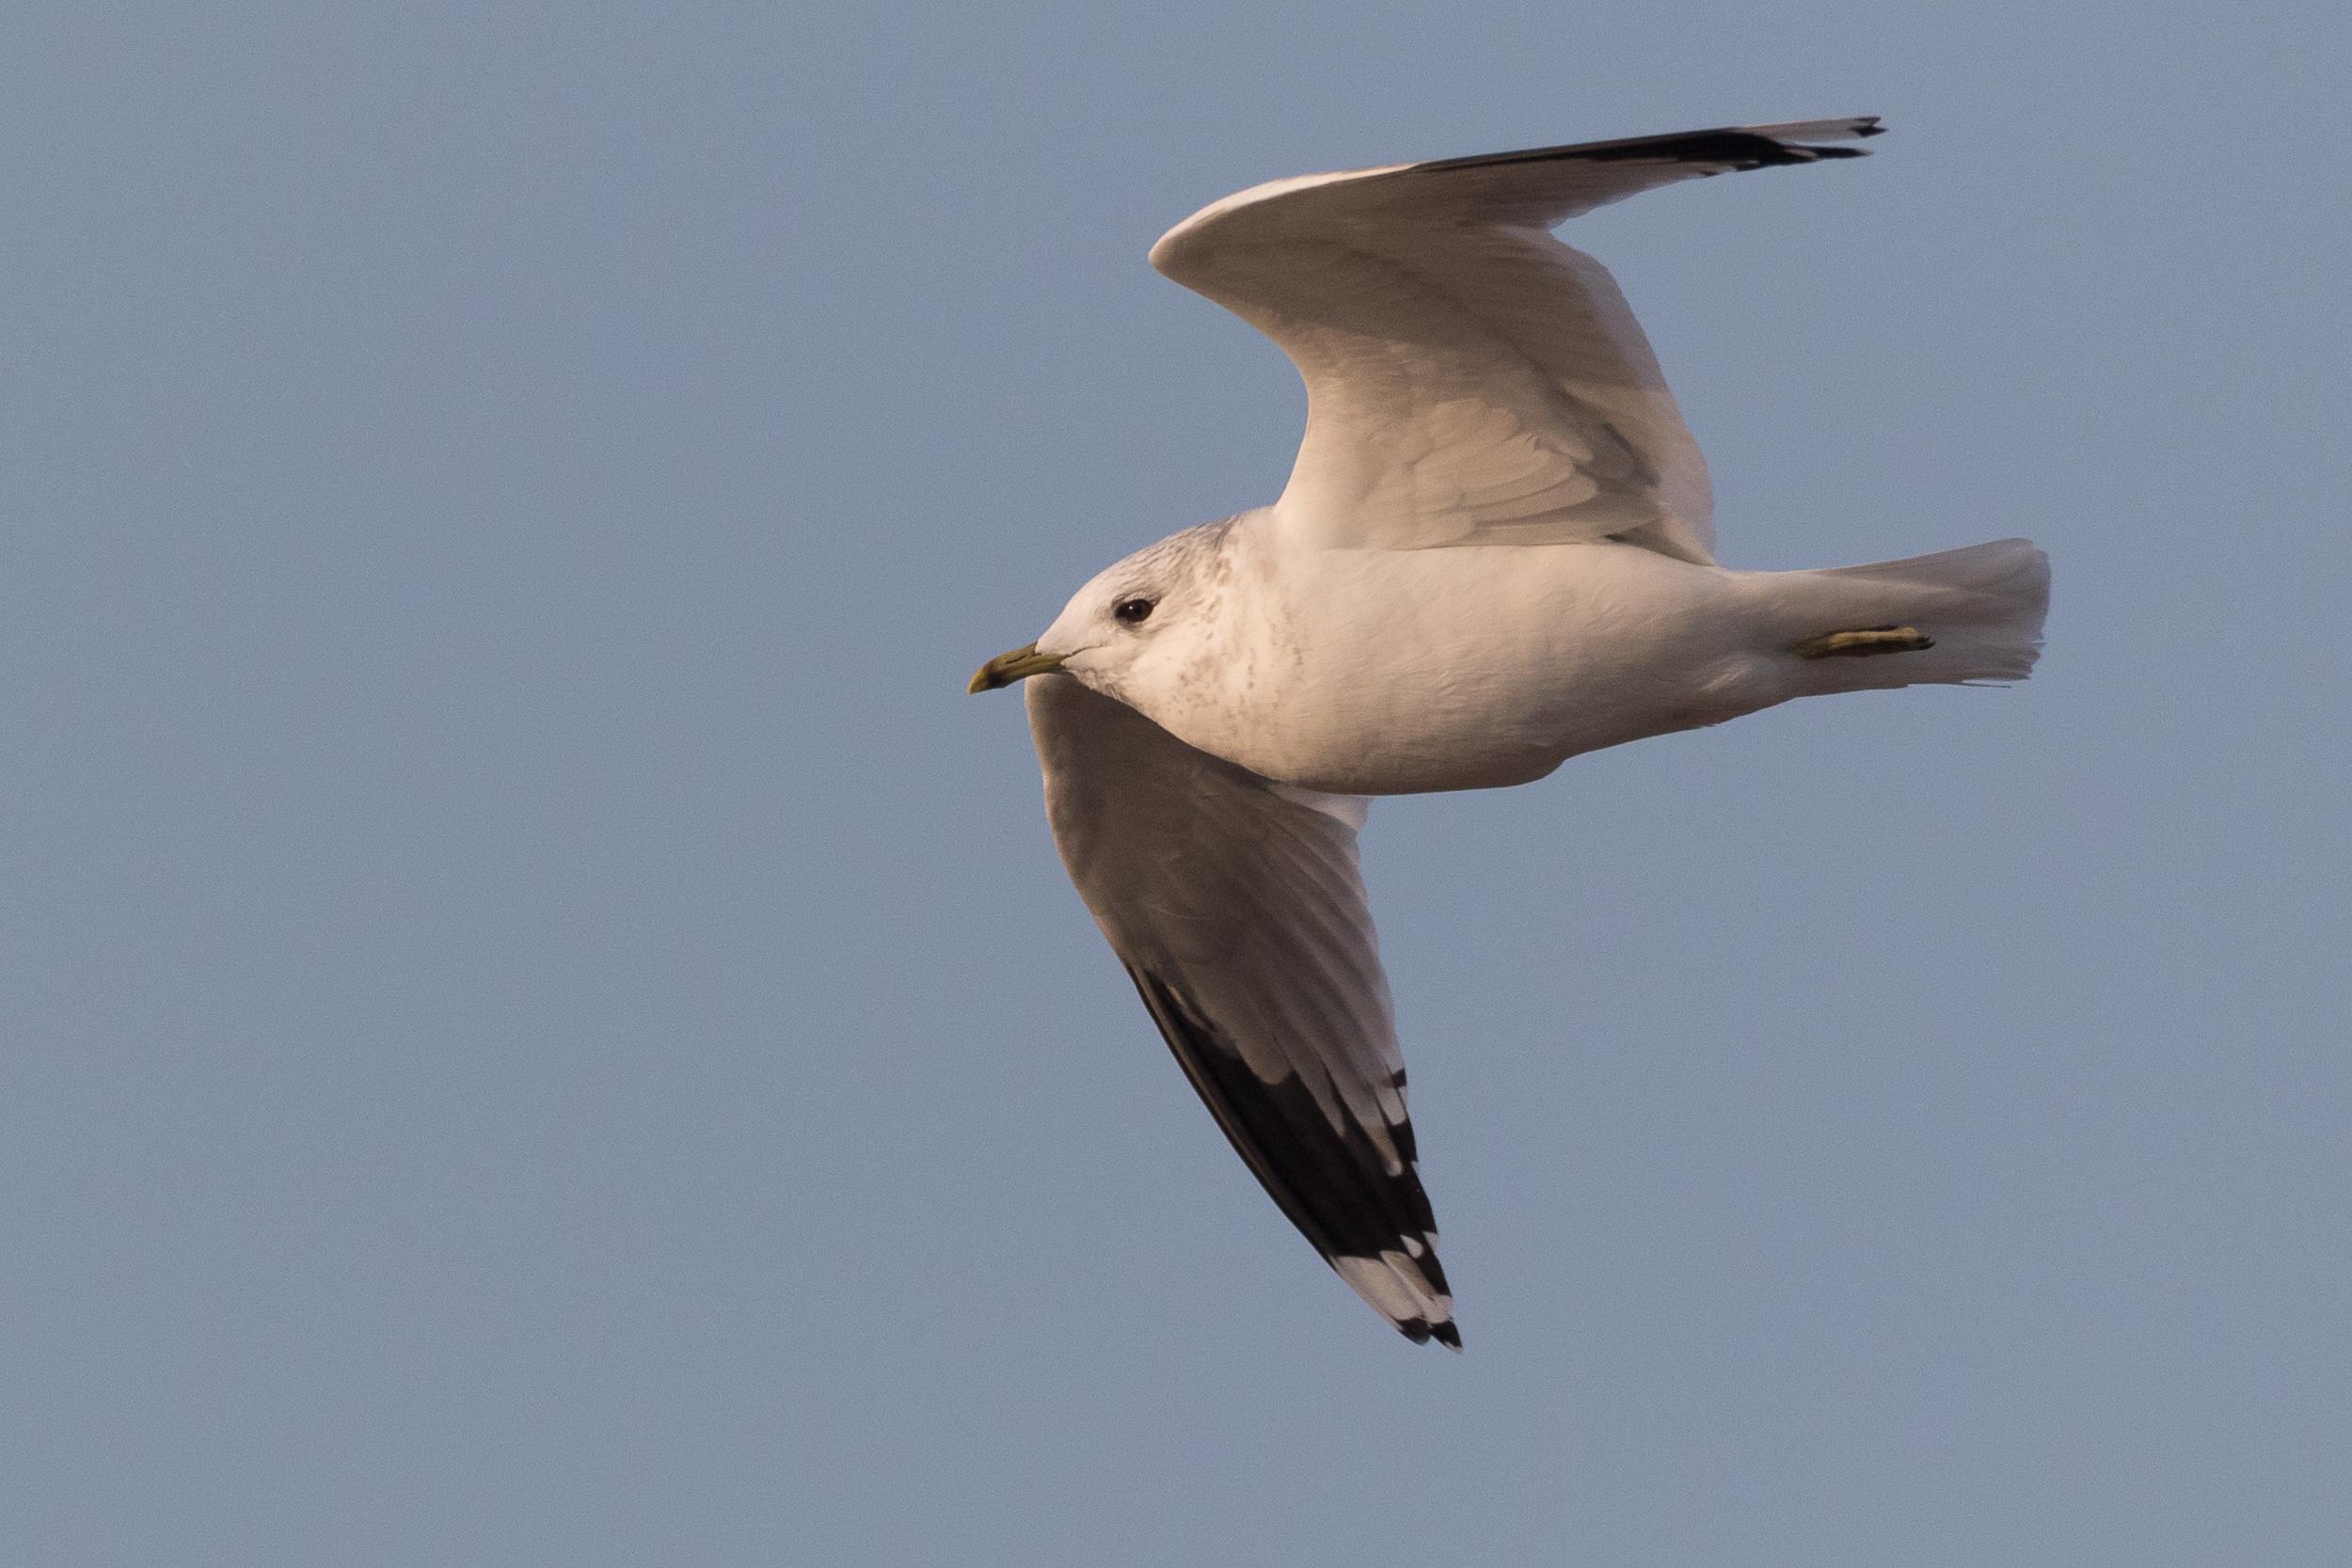 20170126-Common Gull Adult-156.jpg